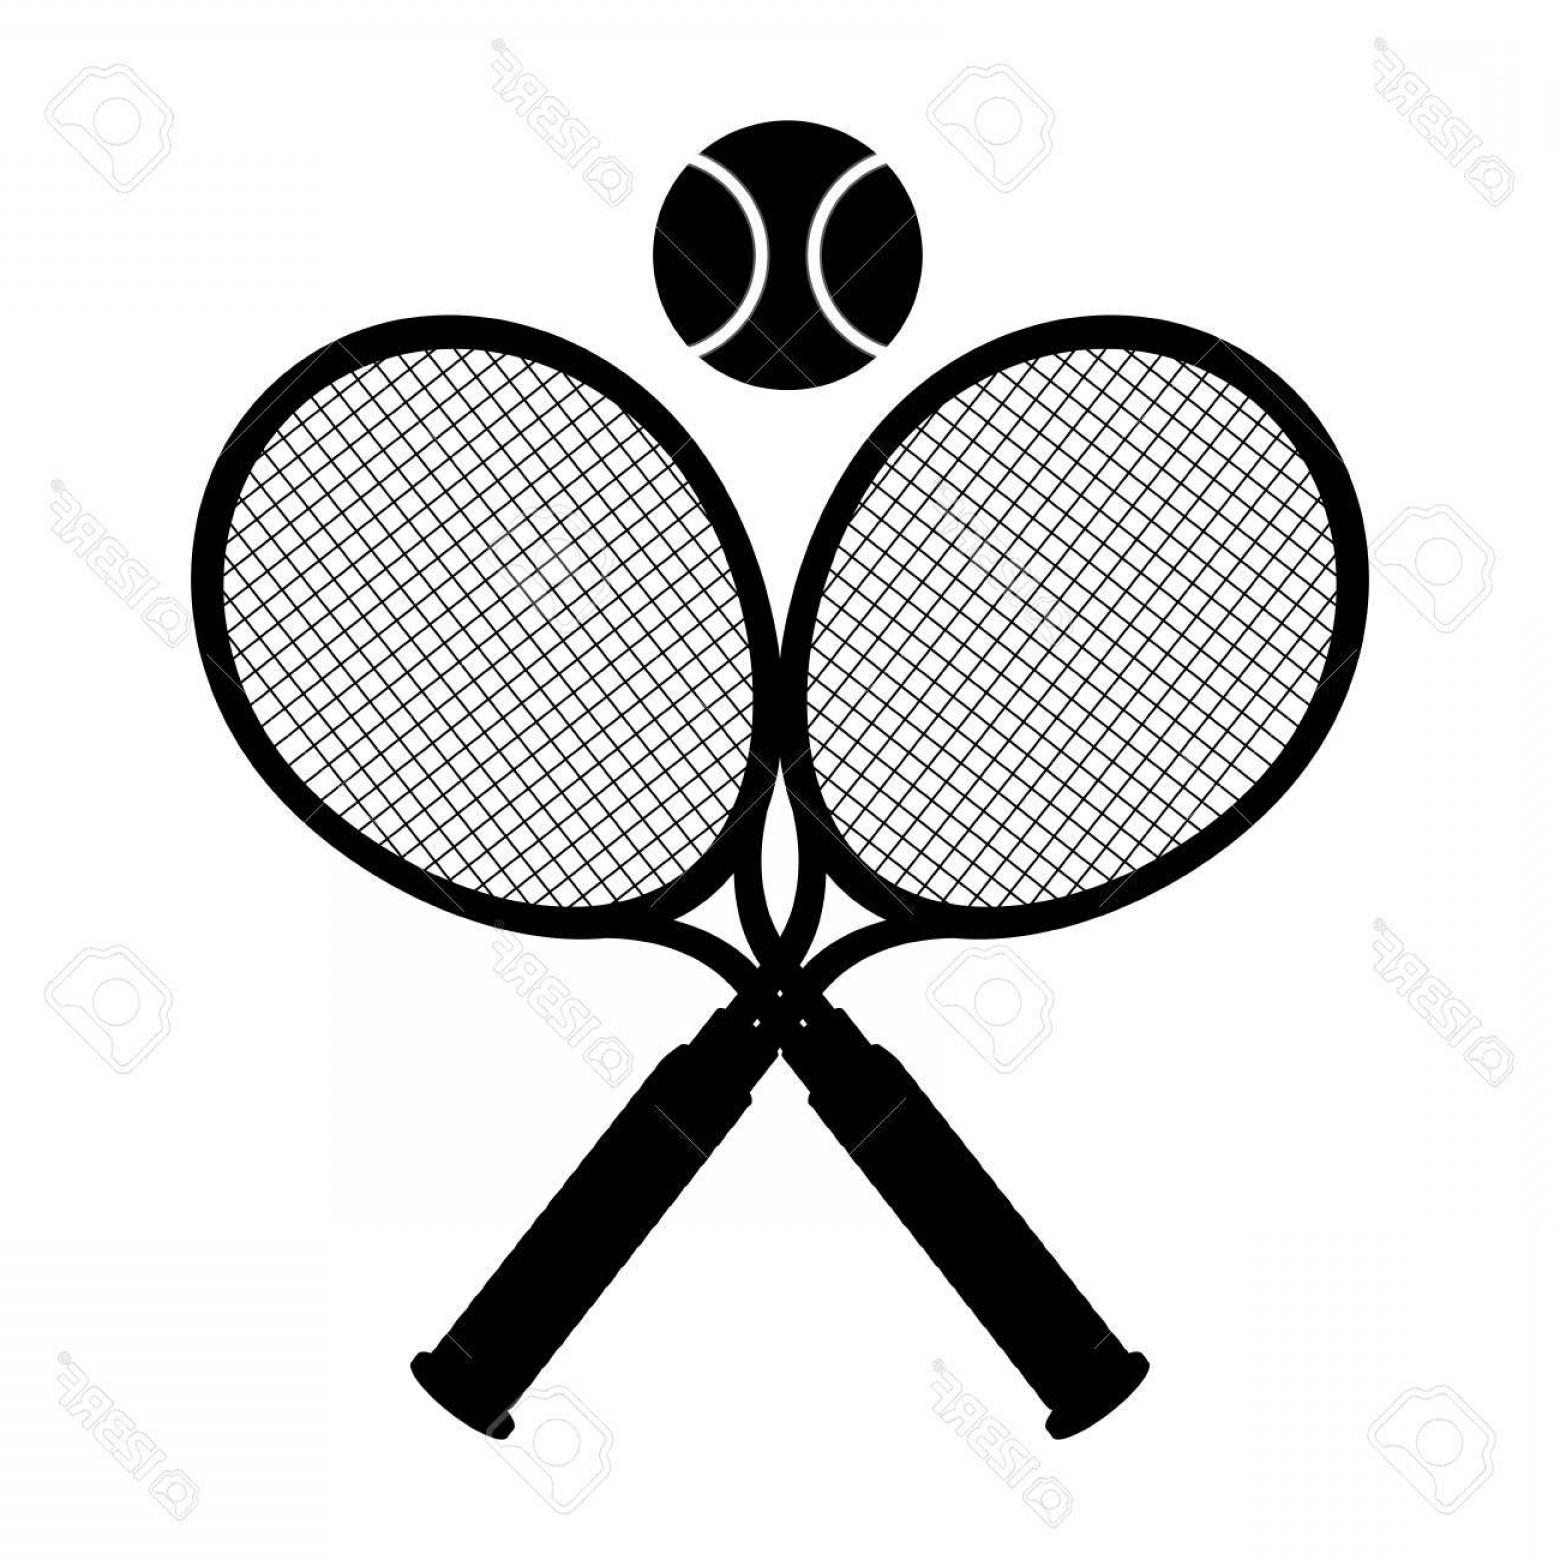 1560x1560 Tennis Icon Vector Geekchicpro